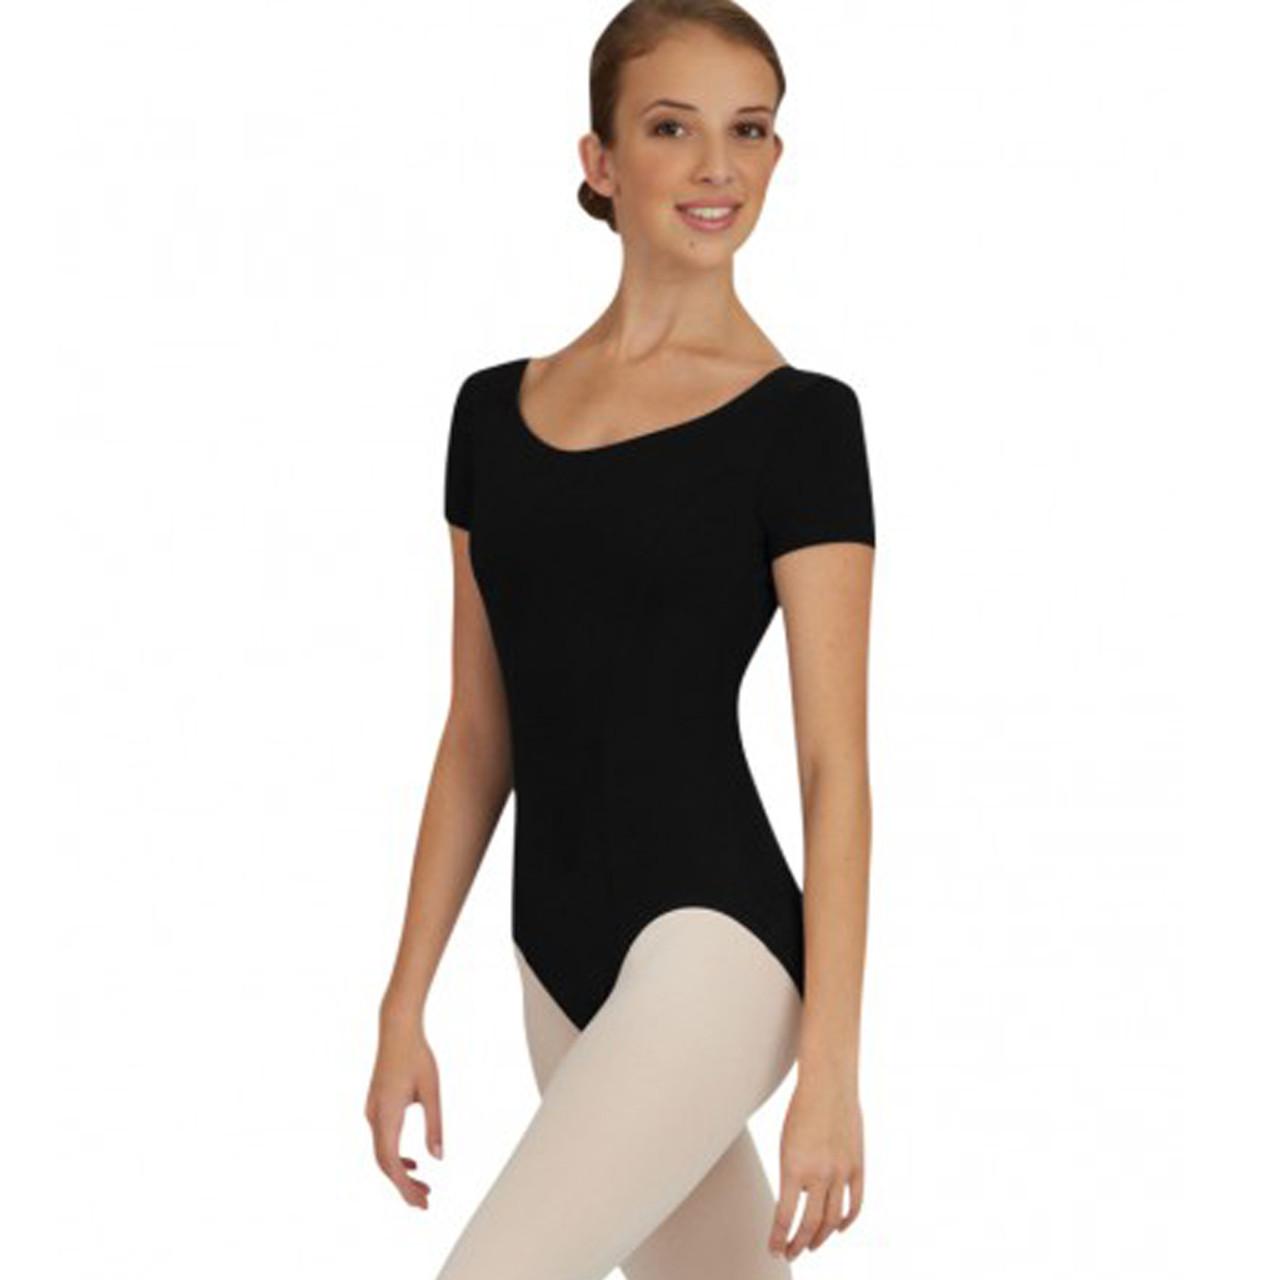 a90926354 Capezio Princess Seam Short Sleeve Leotard - 4 dance